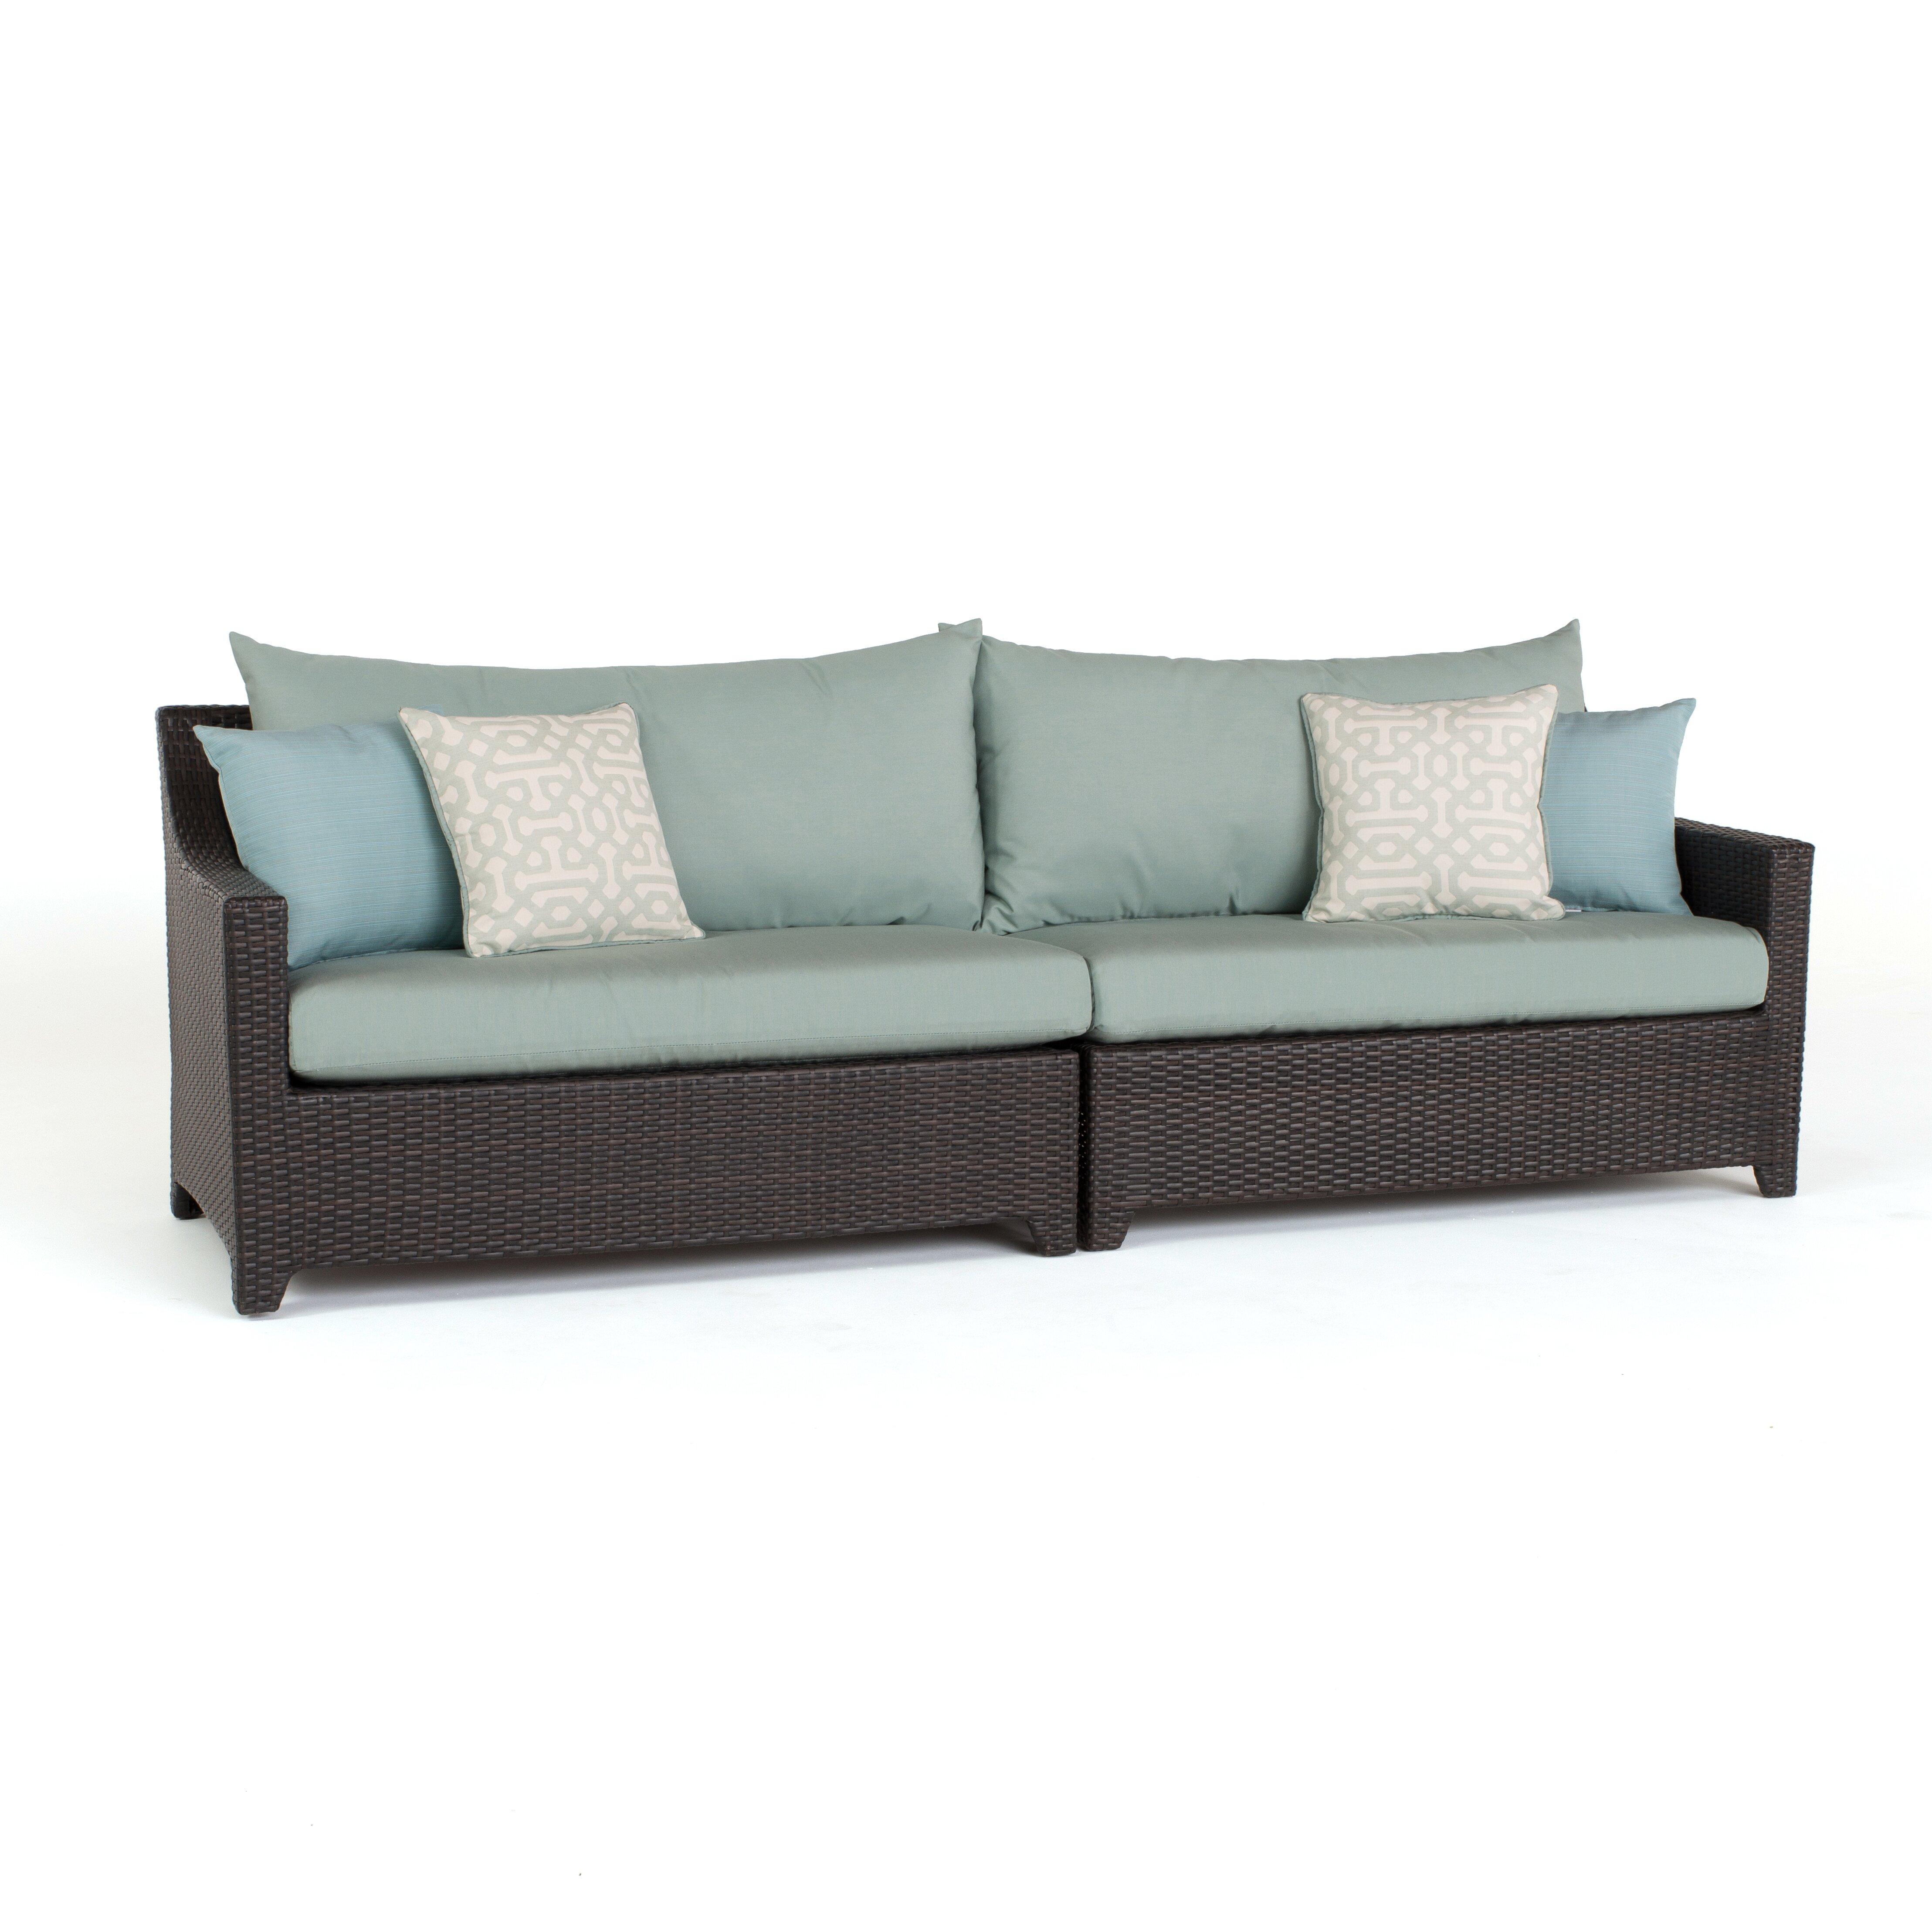 Three Posts Northridge Patio Sofa with Cushion & Reviews | Wayfair